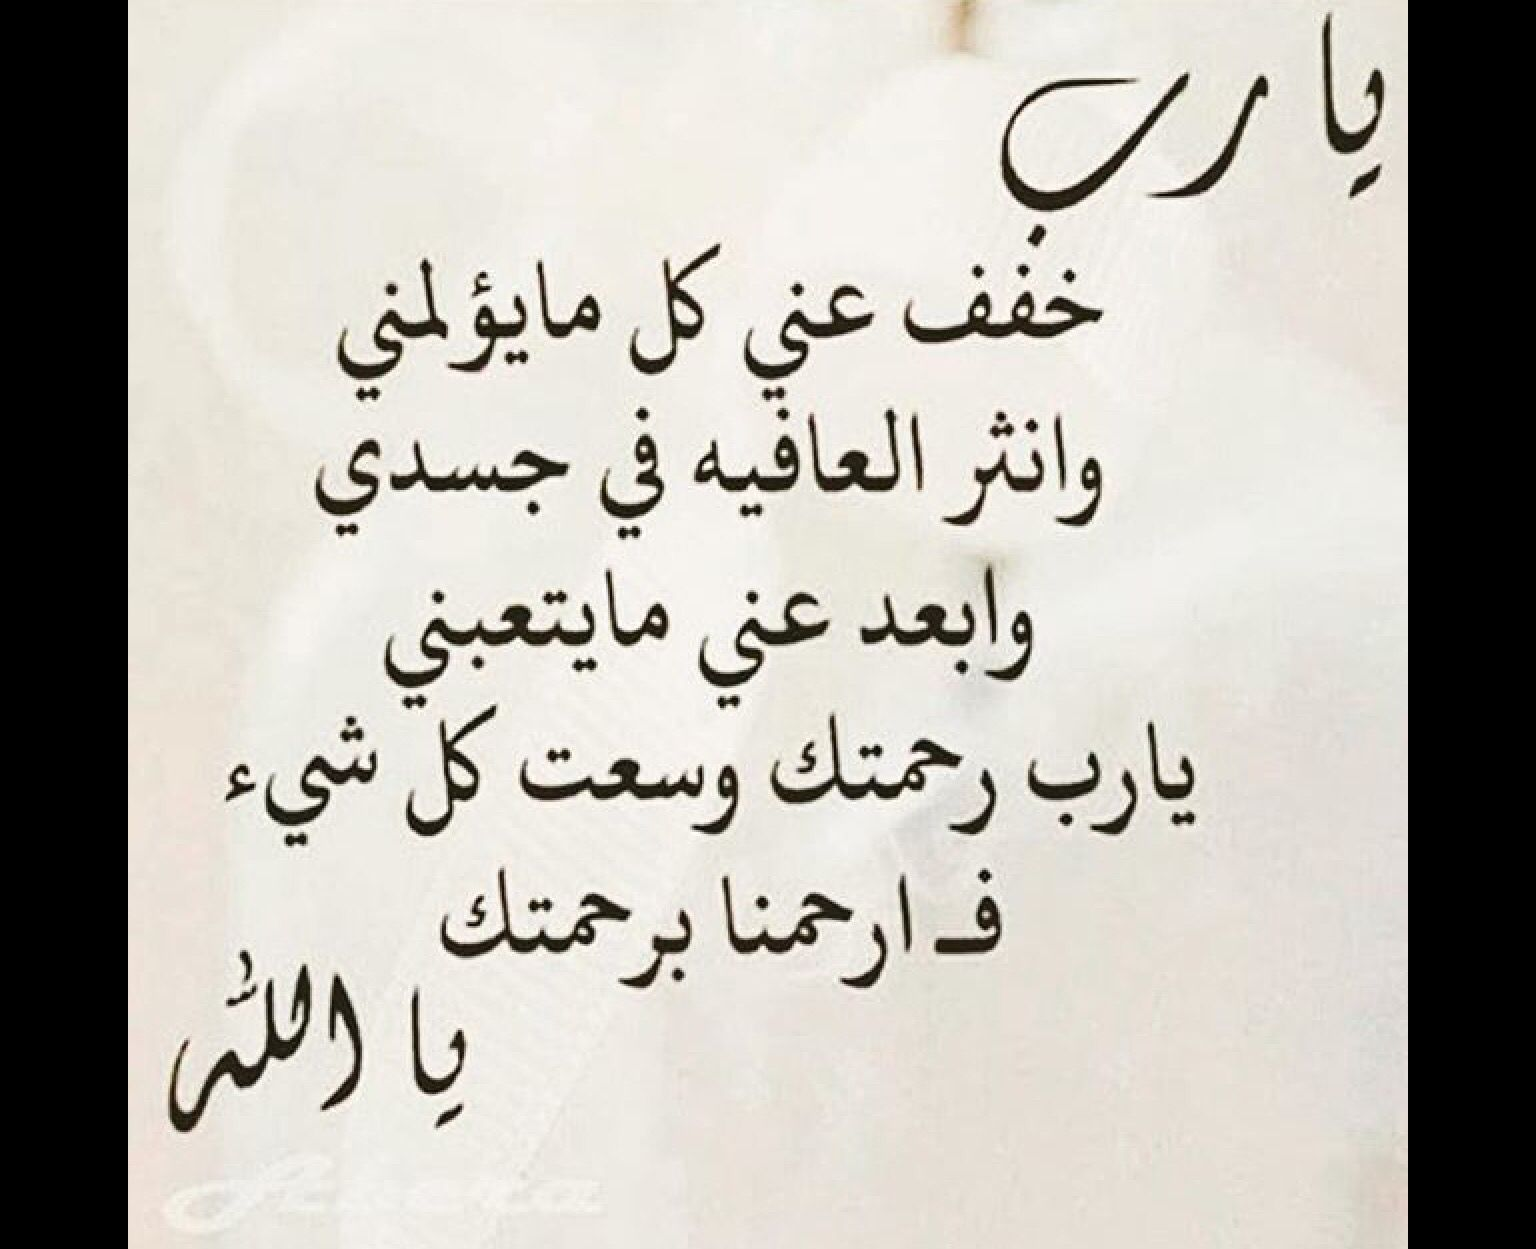 Pin By Hala Alhashmi On دعاء لمن أراد الدعاء Calligraphy Arabic Calligraphy